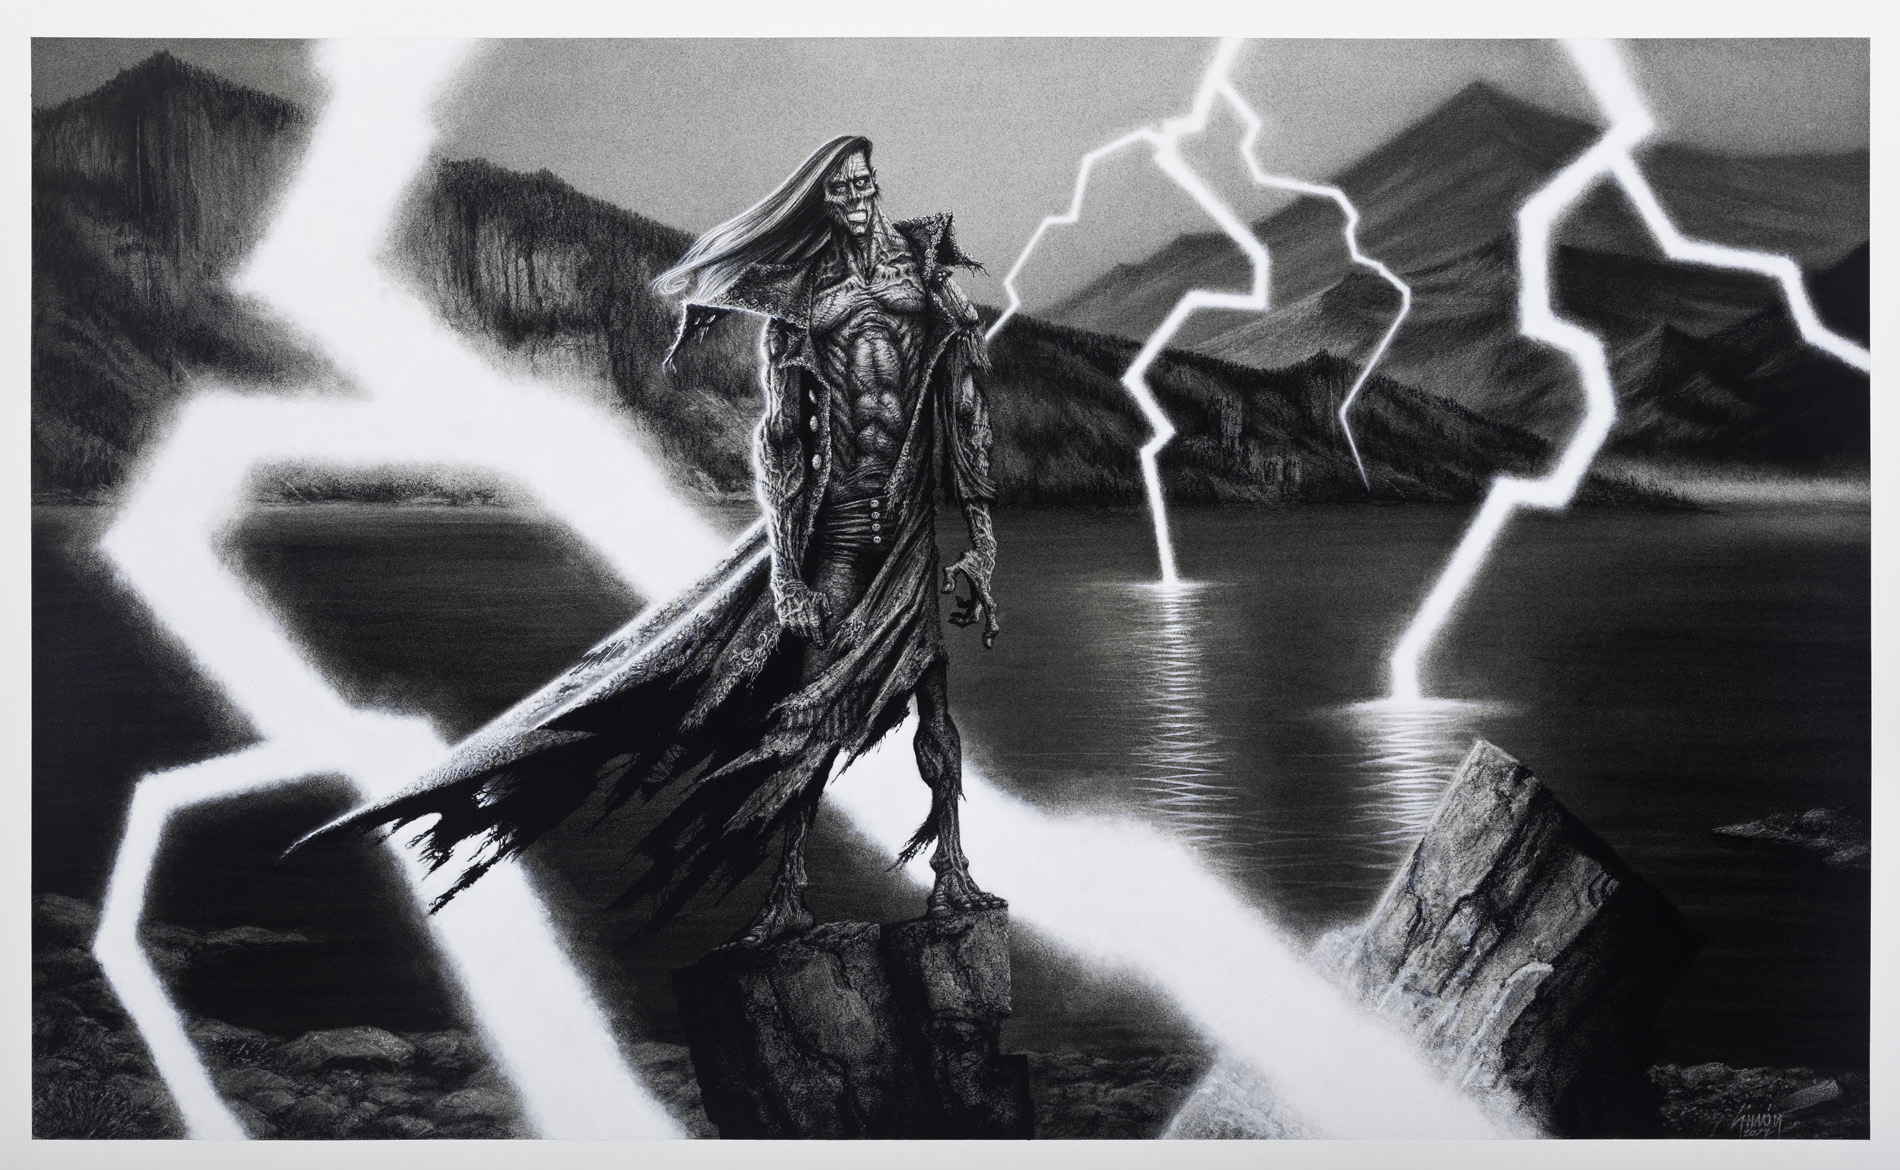 The Creature, by Simón Varela